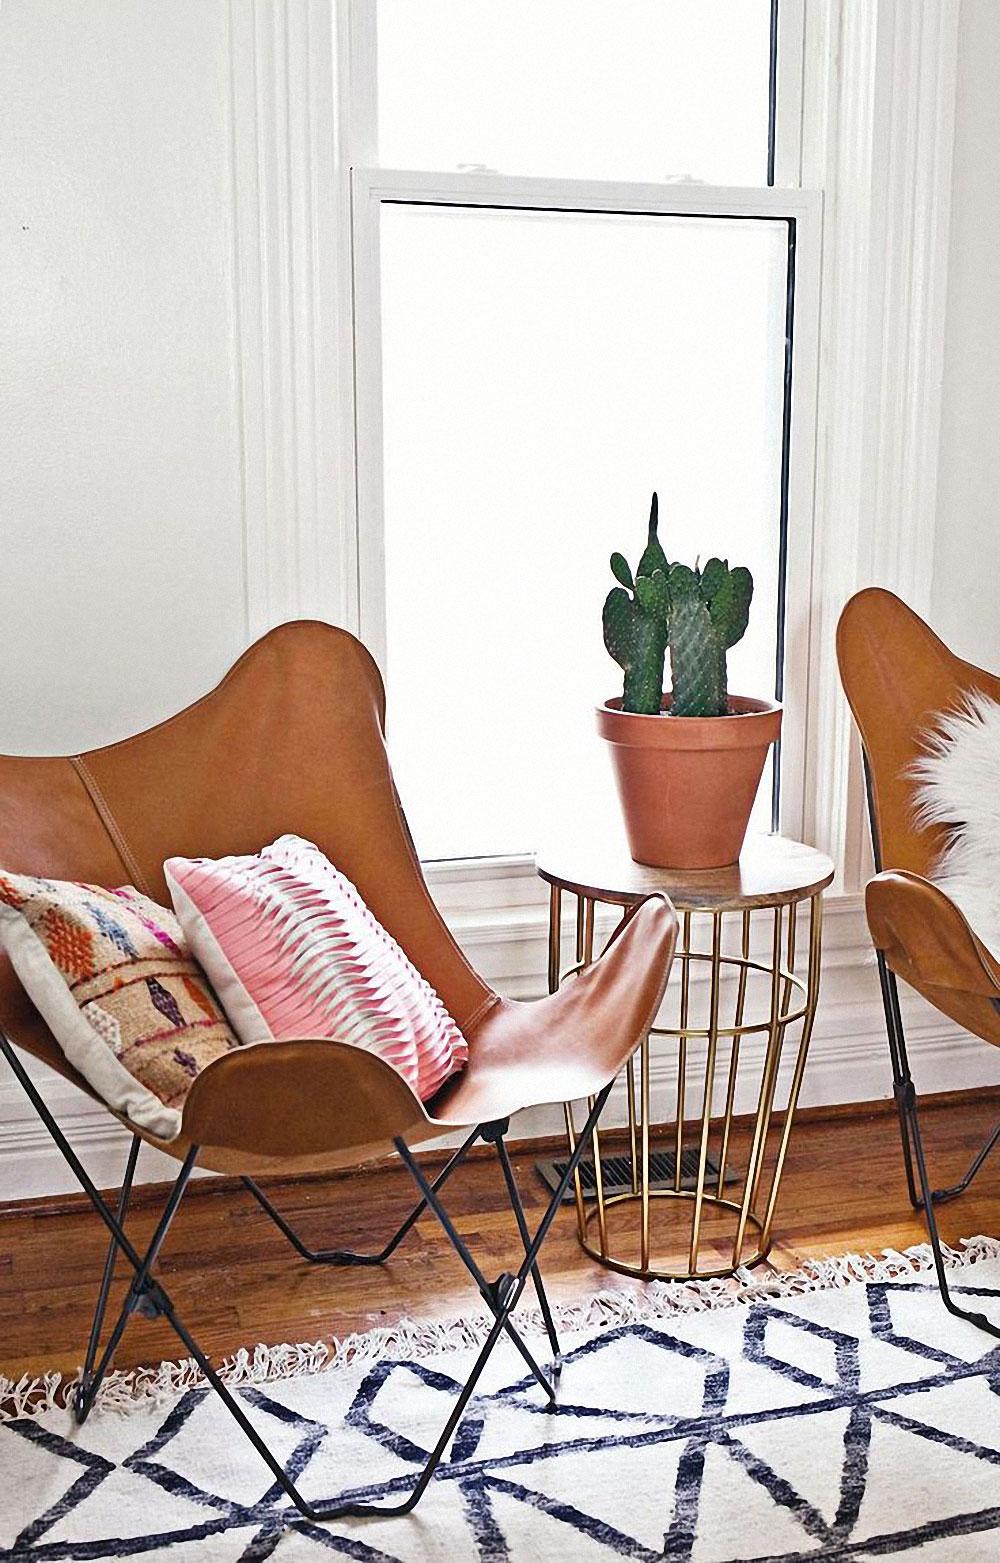 jestcafe.com-butterfly-chair4